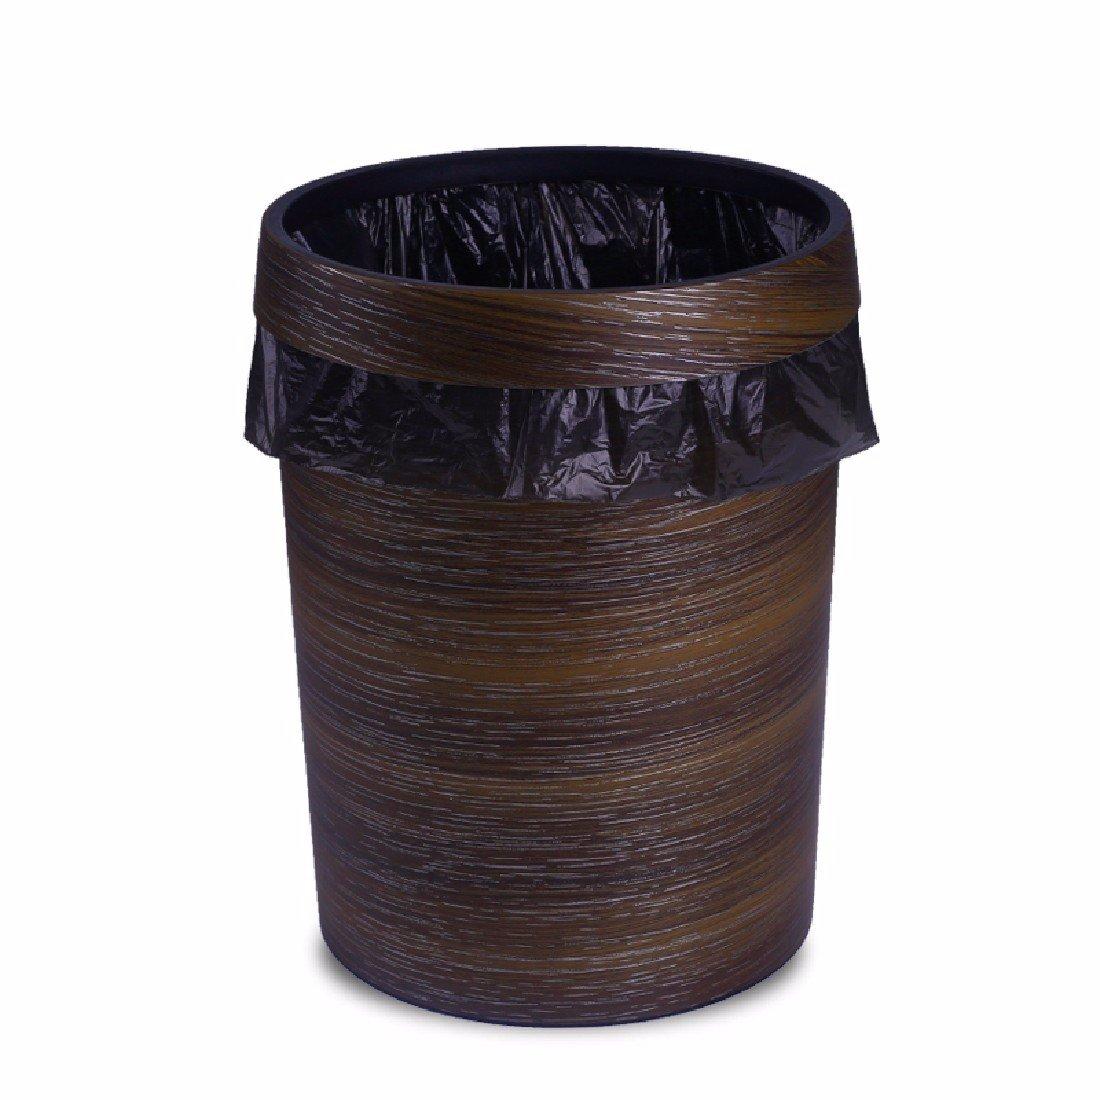 HQLCX-Rubbish Bin Rubbish Bin European Antique Wood Imitation Plastic Trash Cans Household Kitchen And Toilet Hotel Sanitary Pail by HQLCX-Rubbish Bin (Image #1)